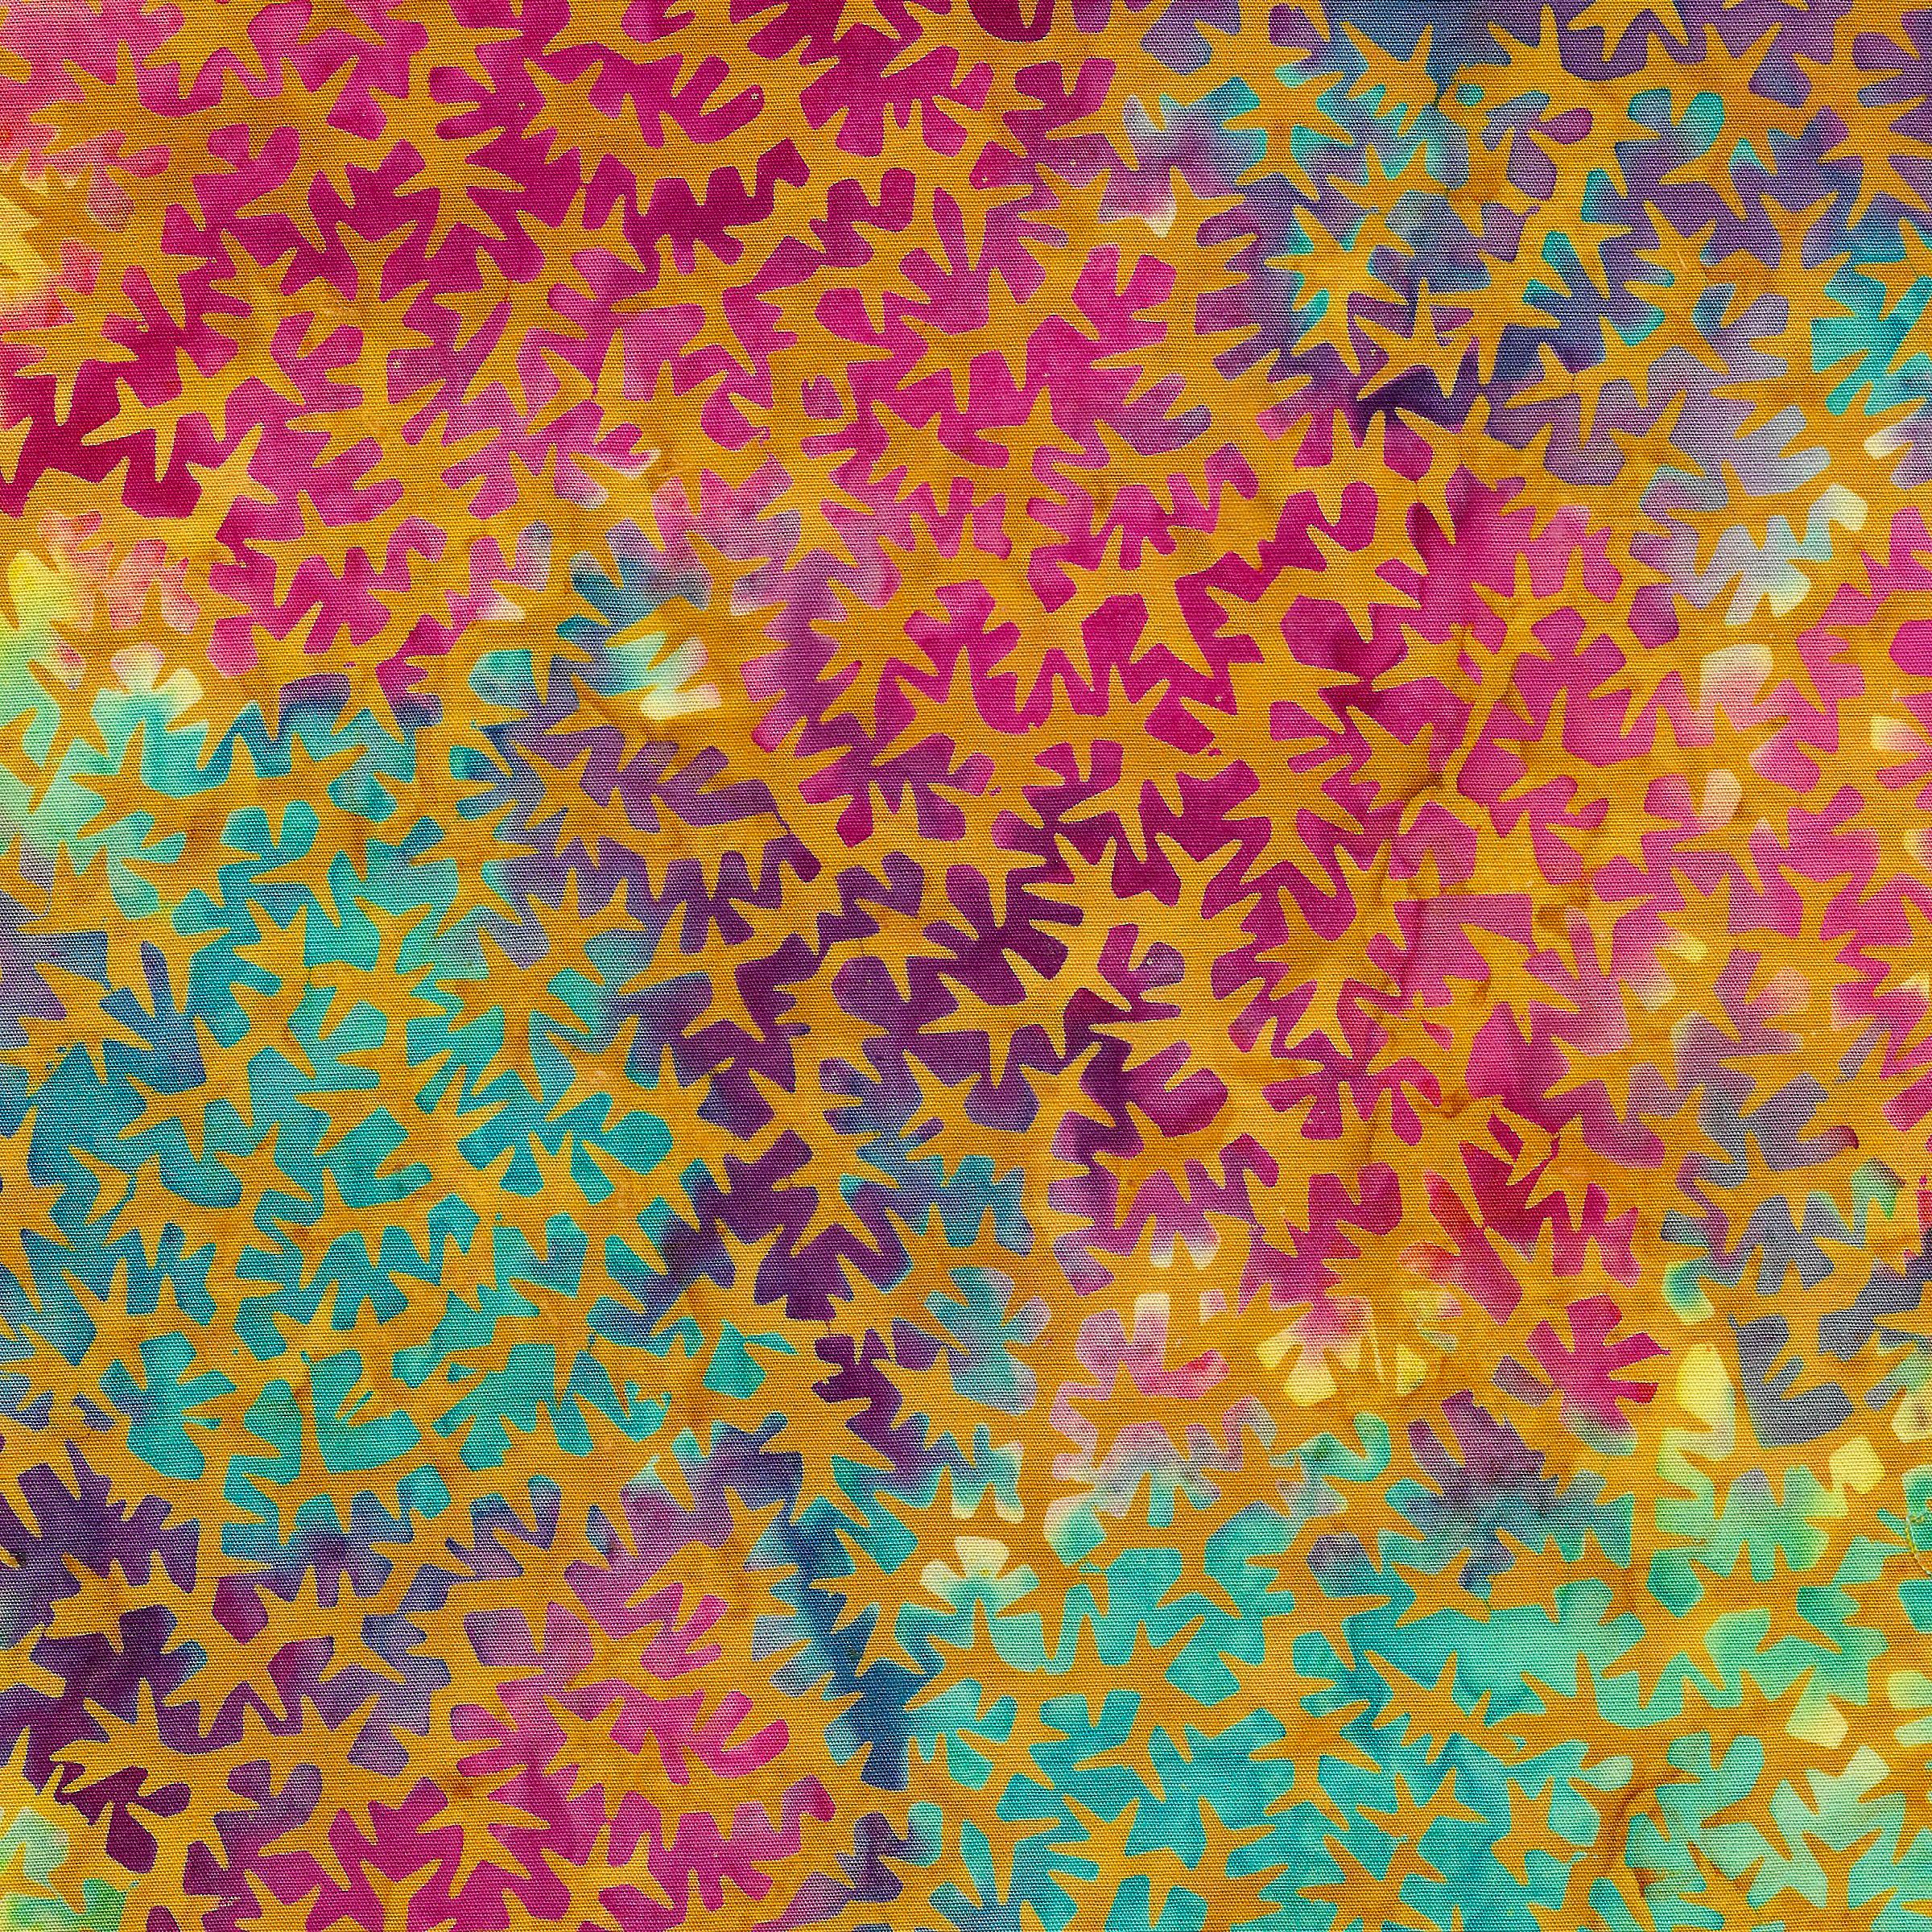 Spikes-Birthday Batik